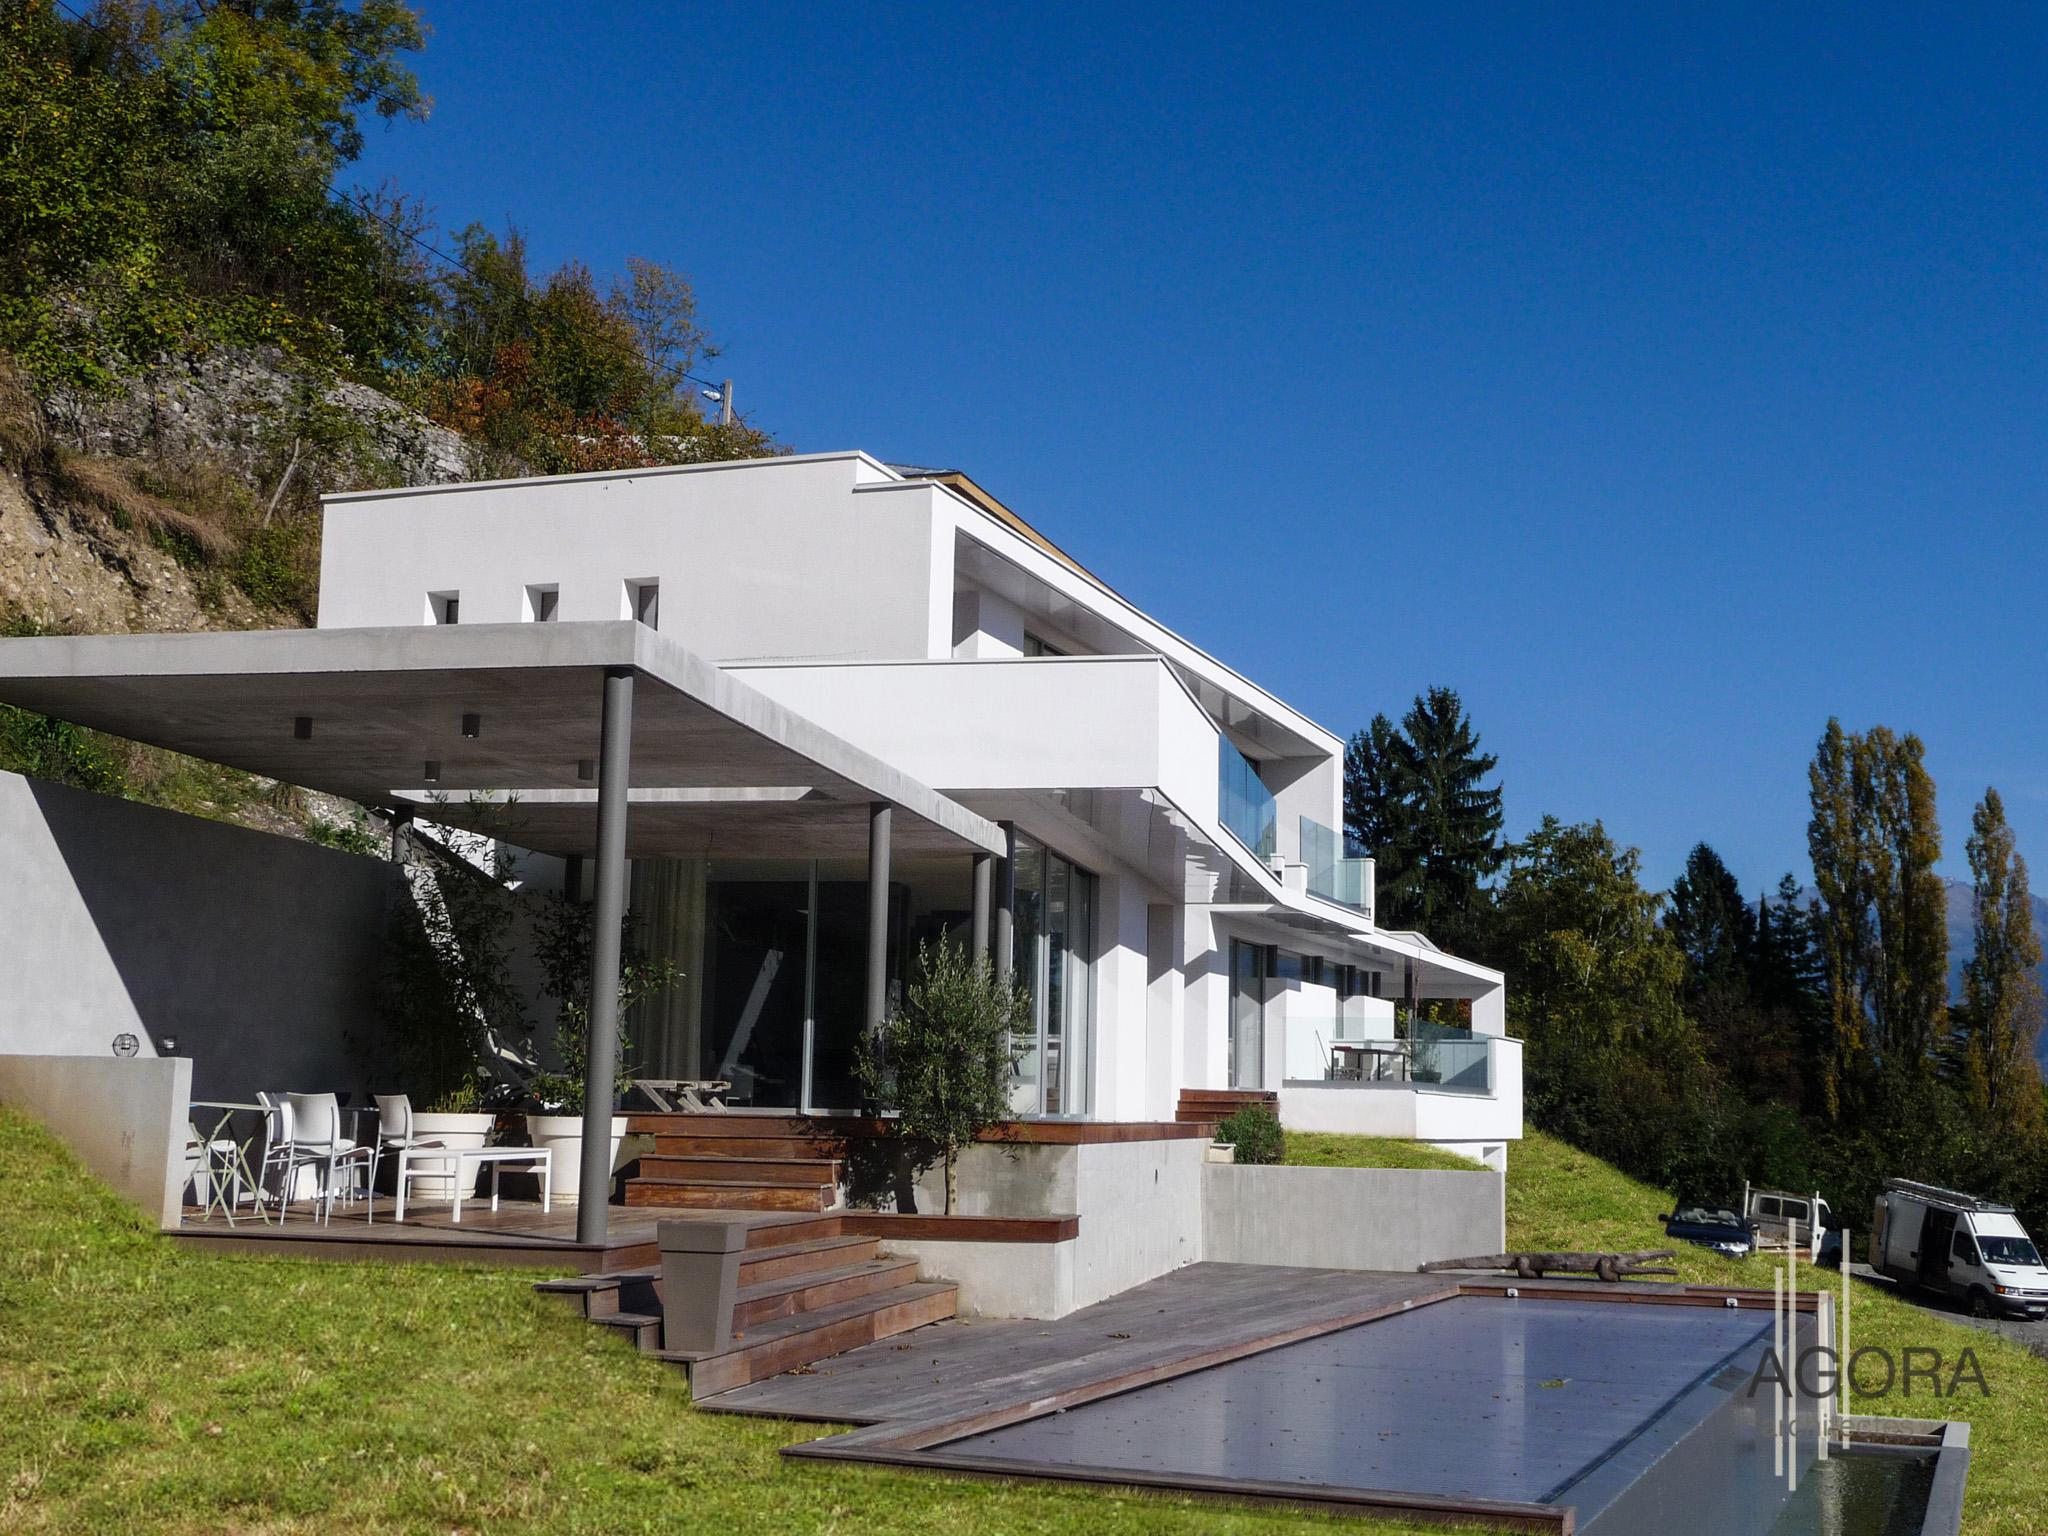 Villa m corenc 38 agora architectes grenoble agora for Architecte grenoble